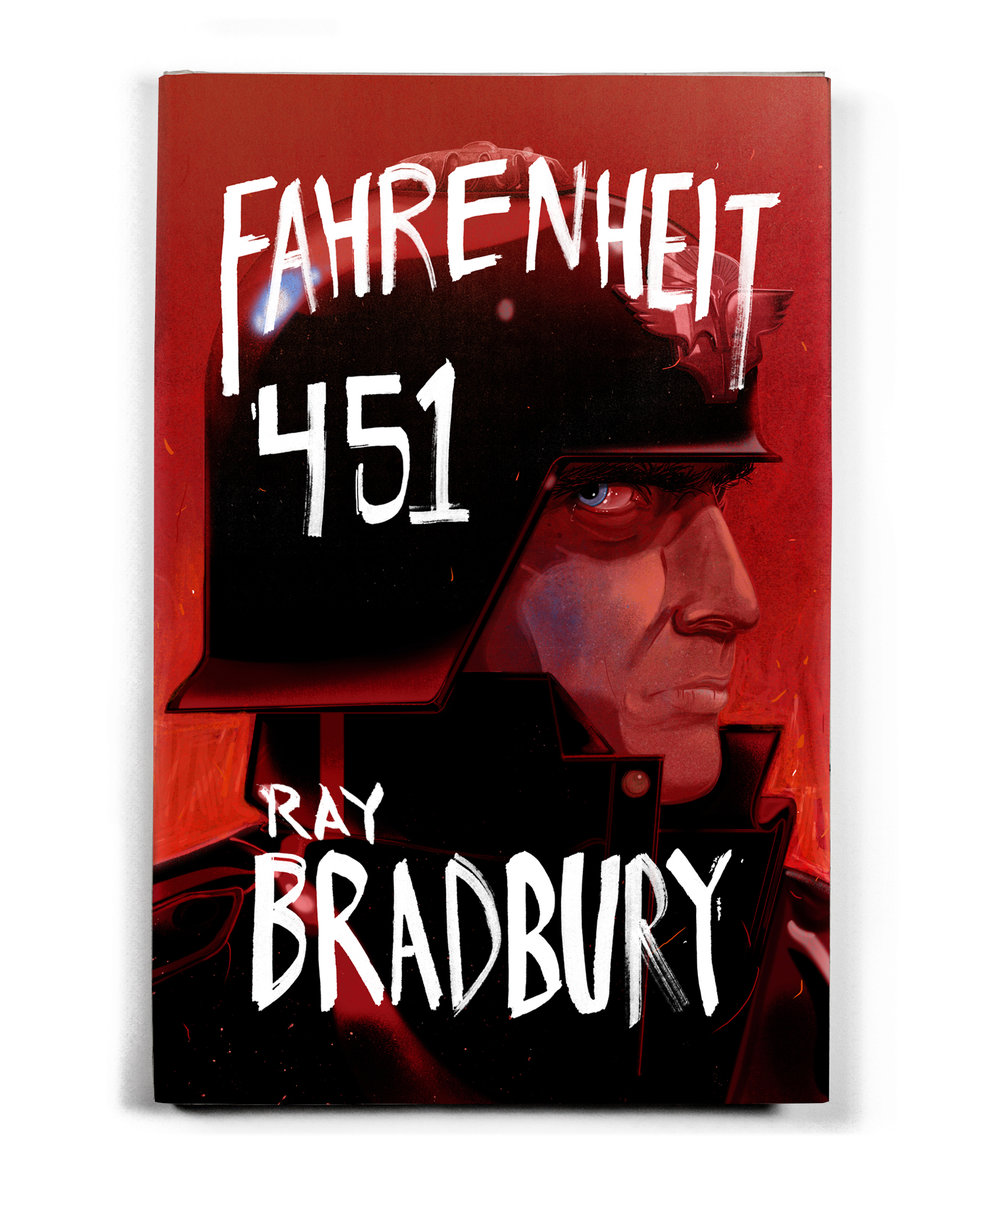 Bartlettf451.jpg